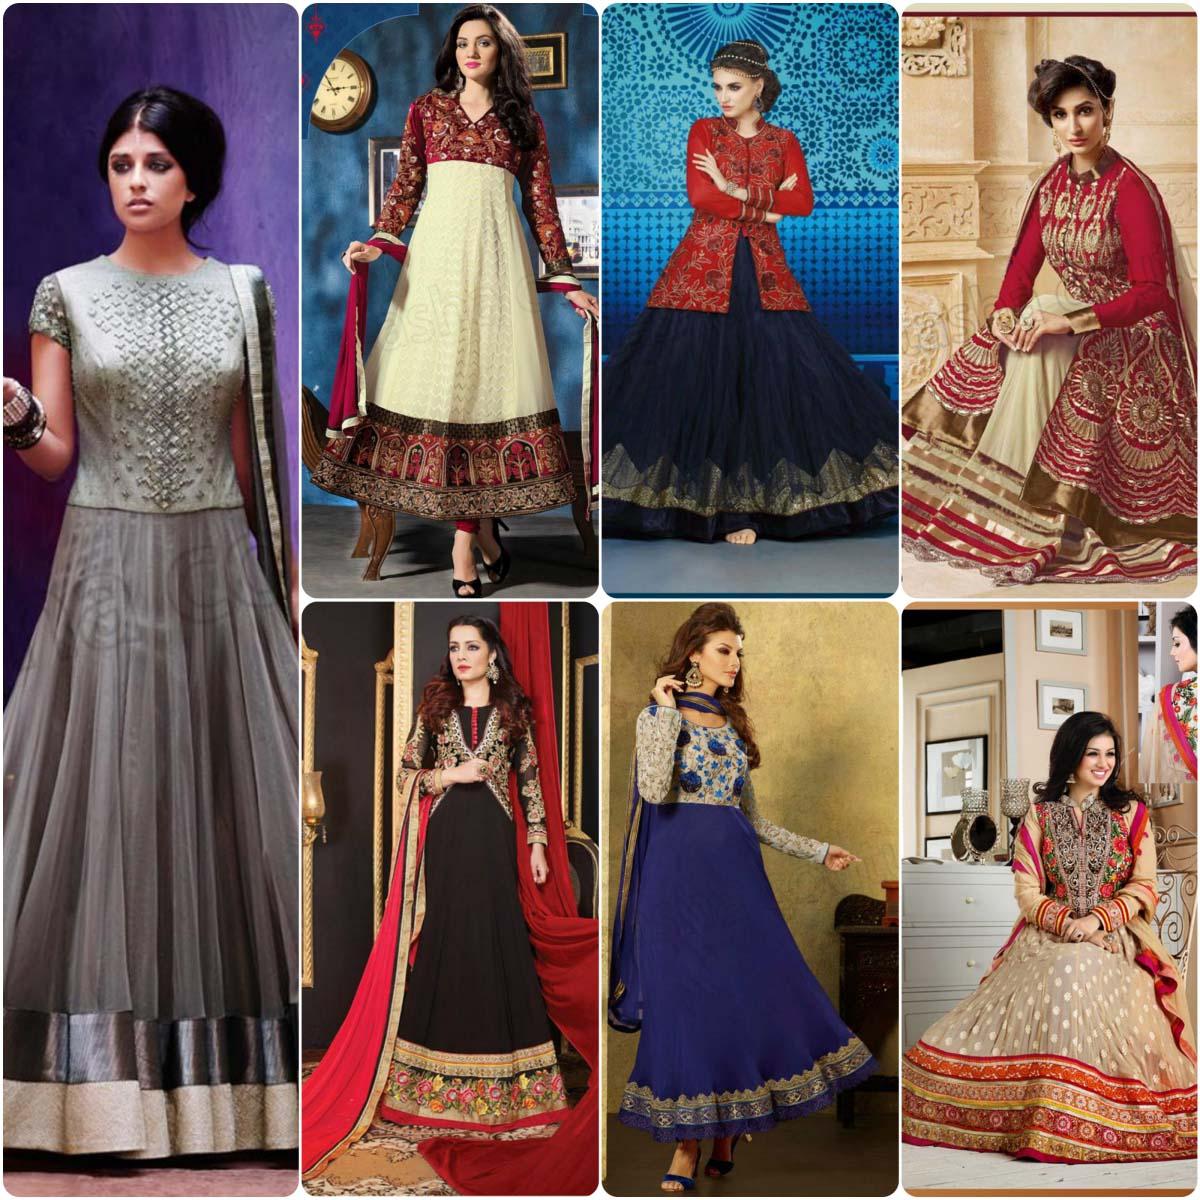 d9a2e61c4 Natasha Couture Latest Indian Anarkali Dress Desigs Collection 2016-2017